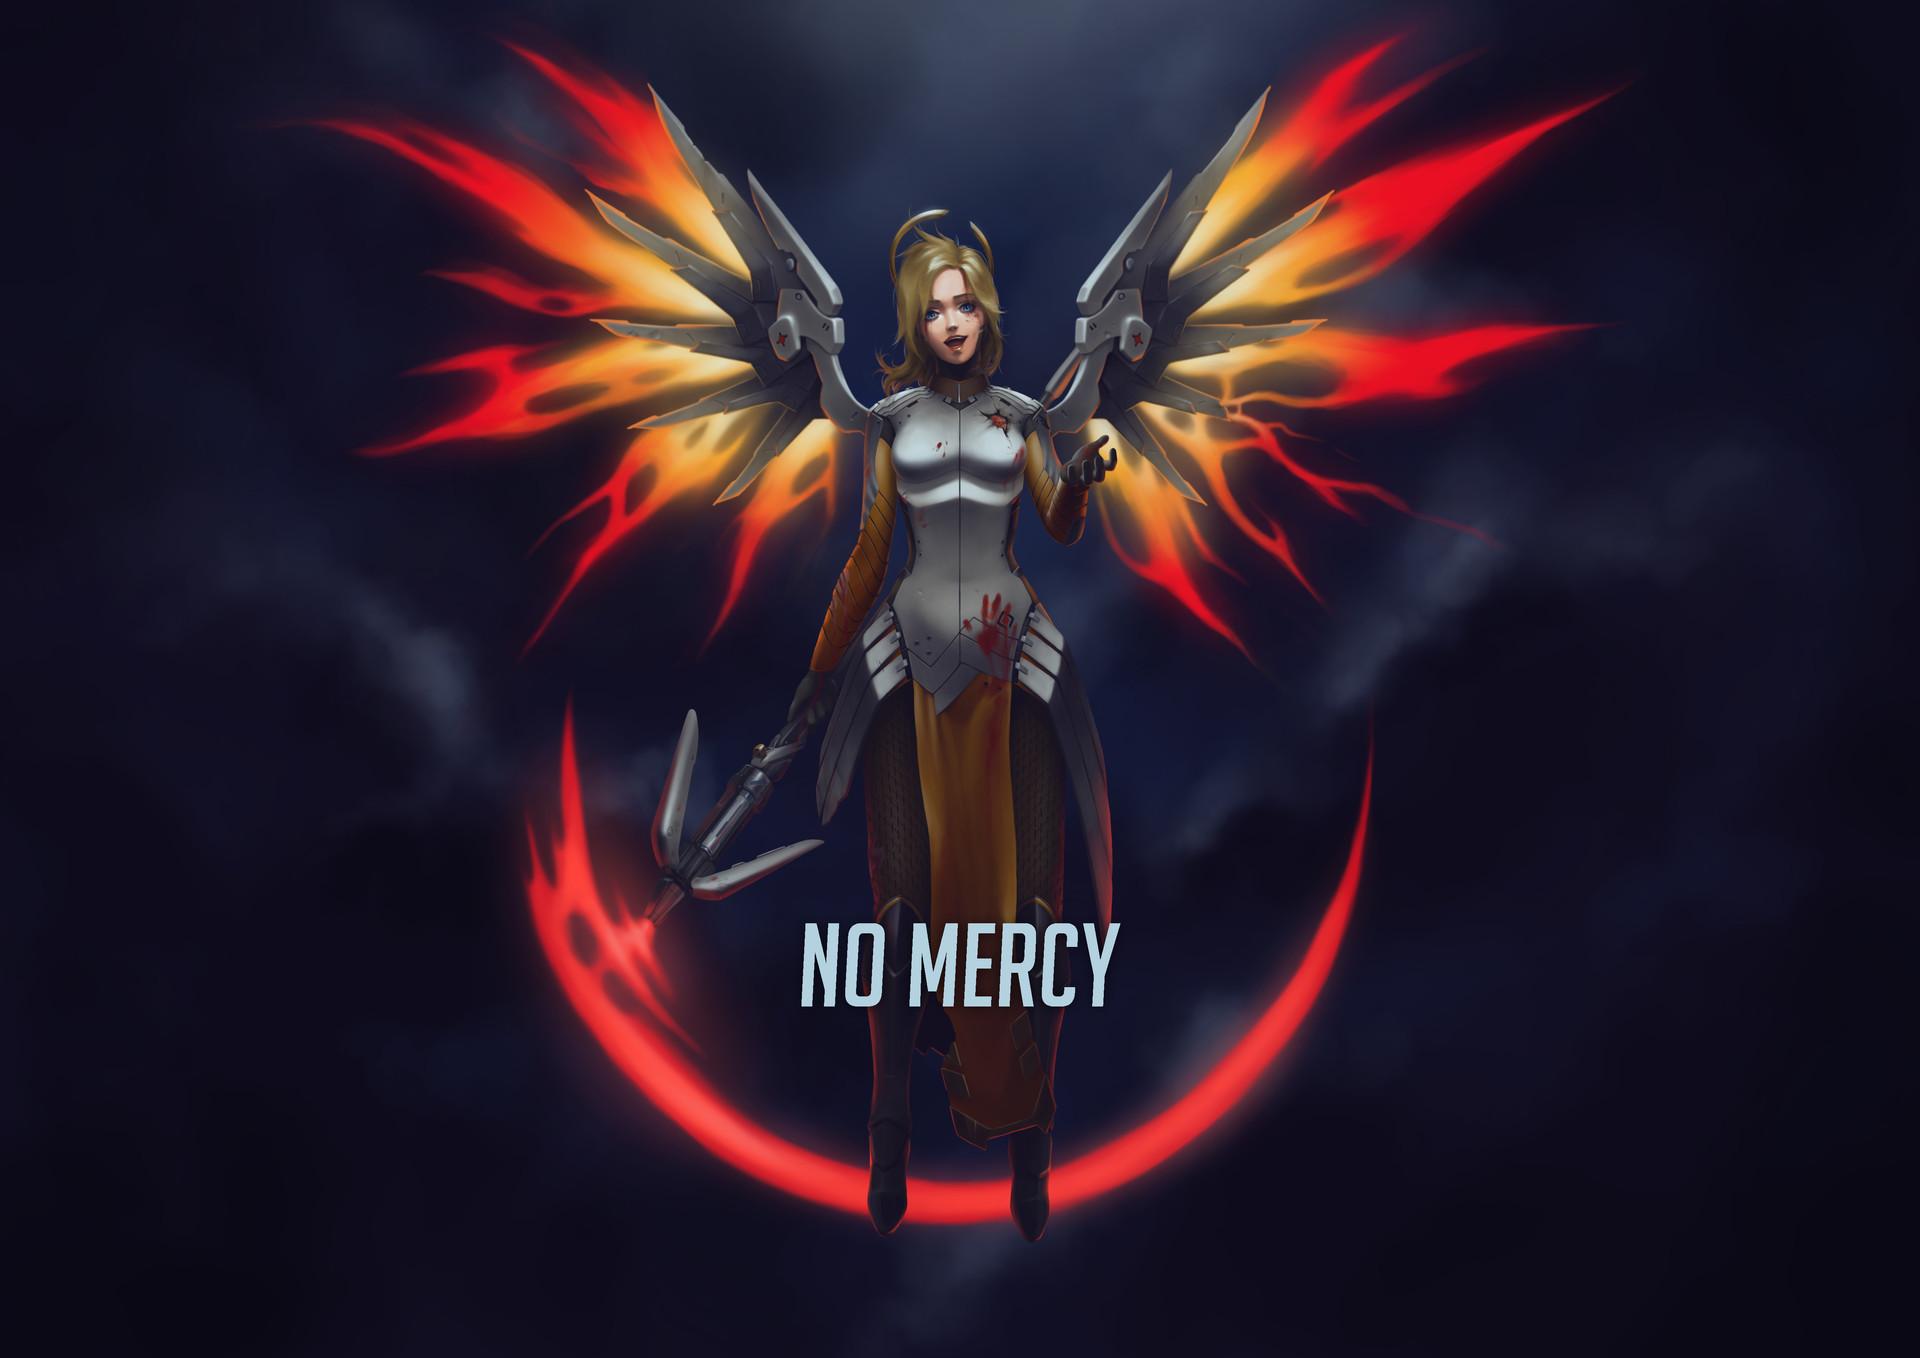 Artmancer Imaginarium No Mercy Overwatch Wallpaper Fan Art